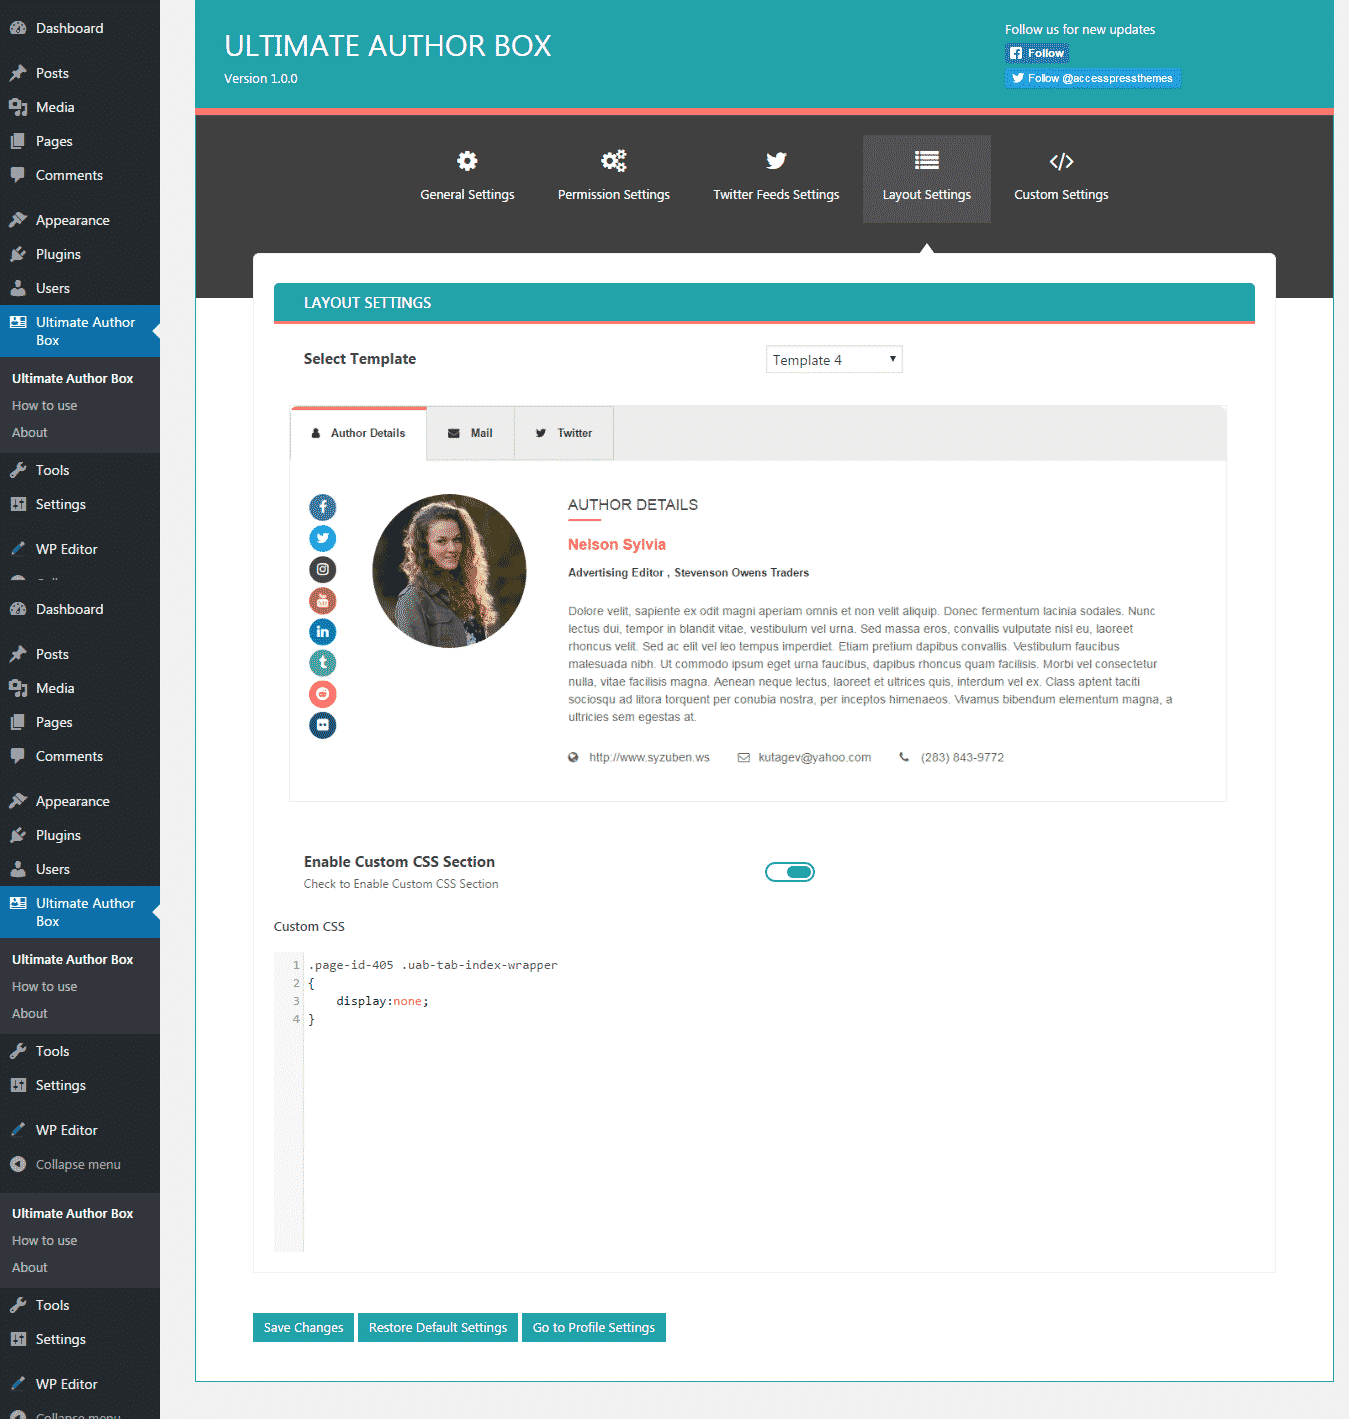 Ultimate Author Box: Layout Settings